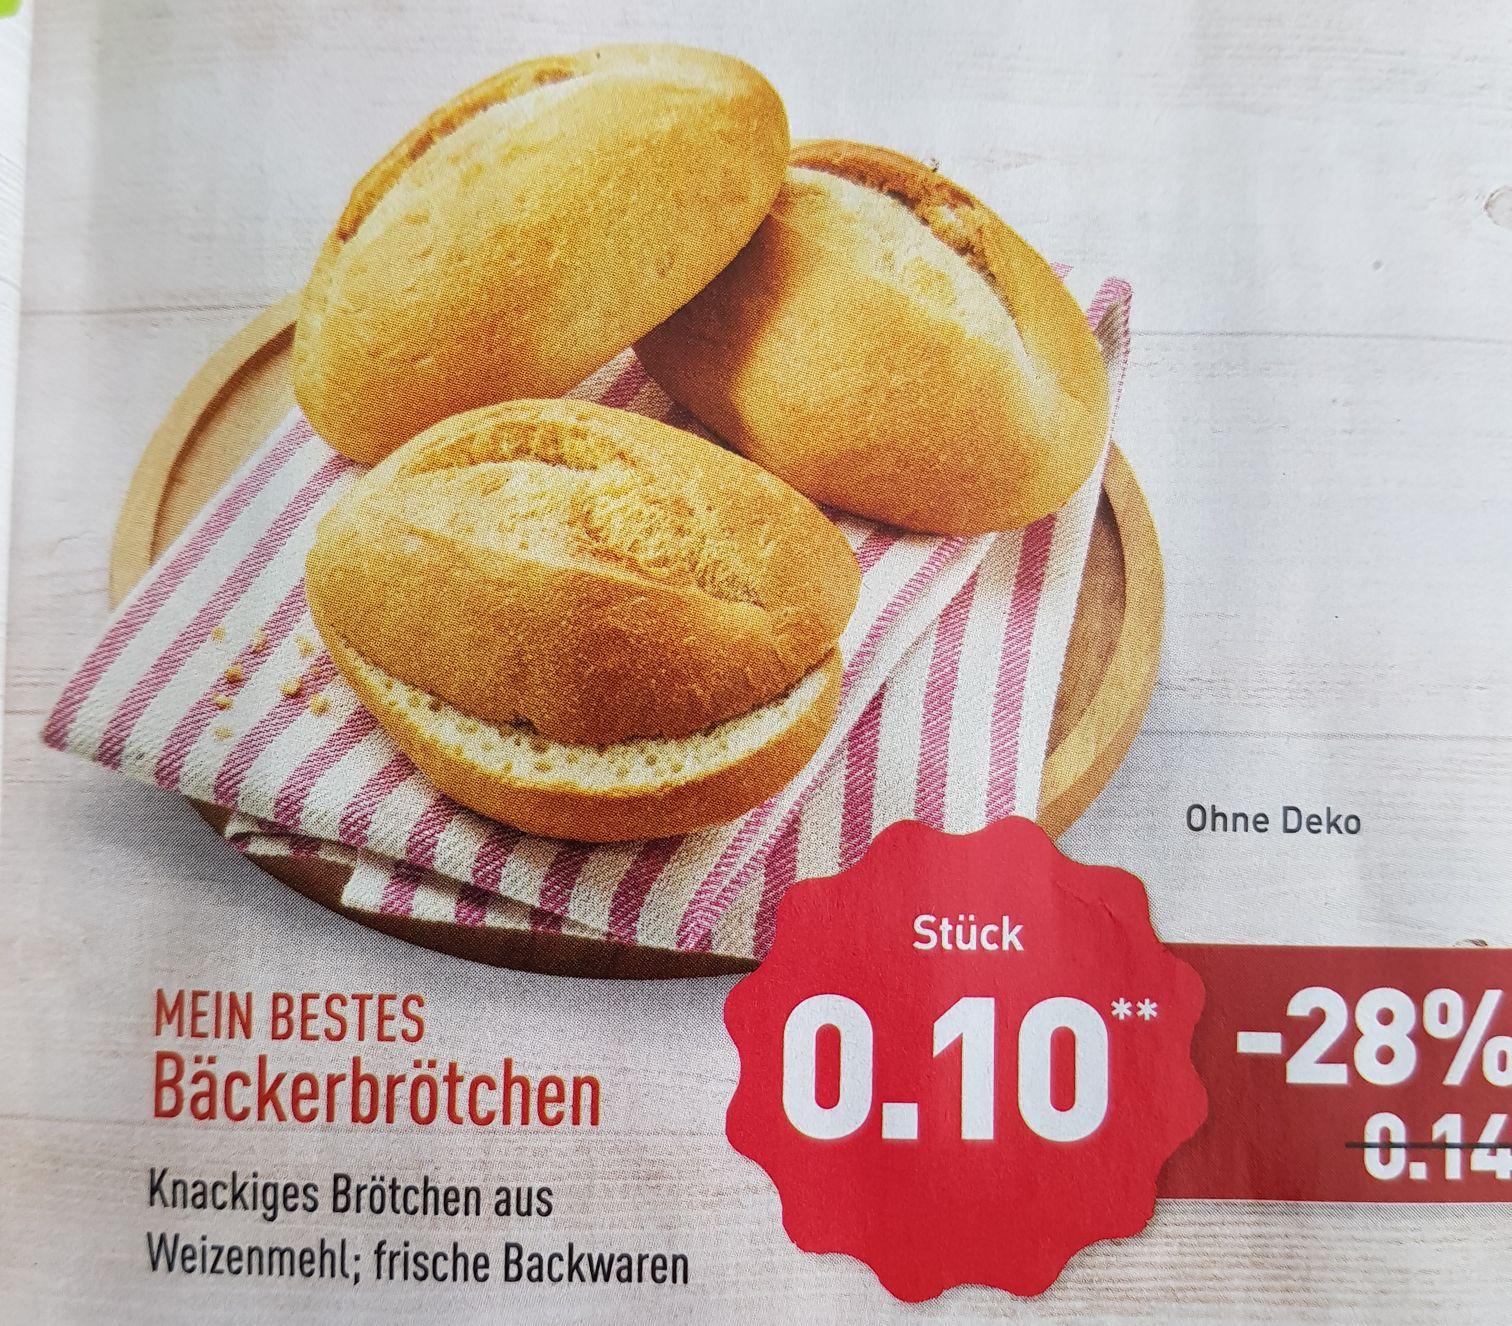 [Aldi-Nord] Knackige Bäckerbrötchen